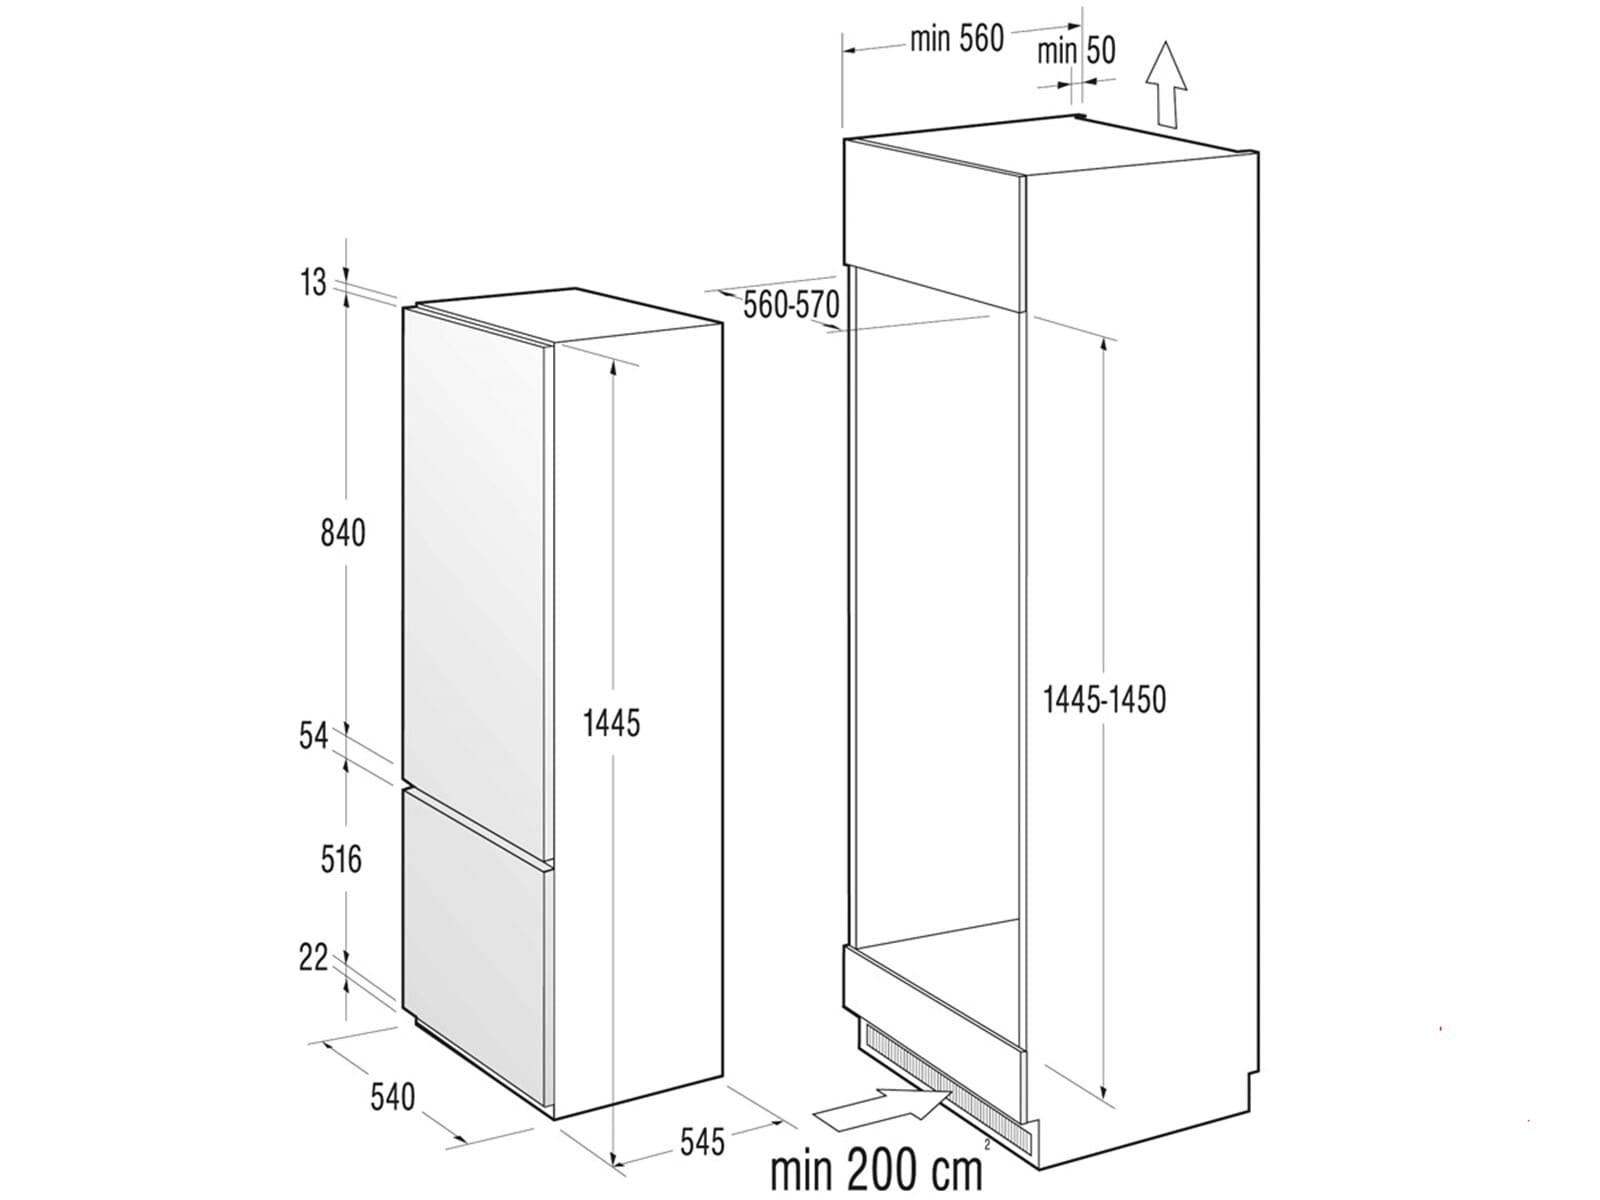 gorenje rki 4151 aw einbau k hl gefrierkombination. Black Bedroom Furniture Sets. Home Design Ideas